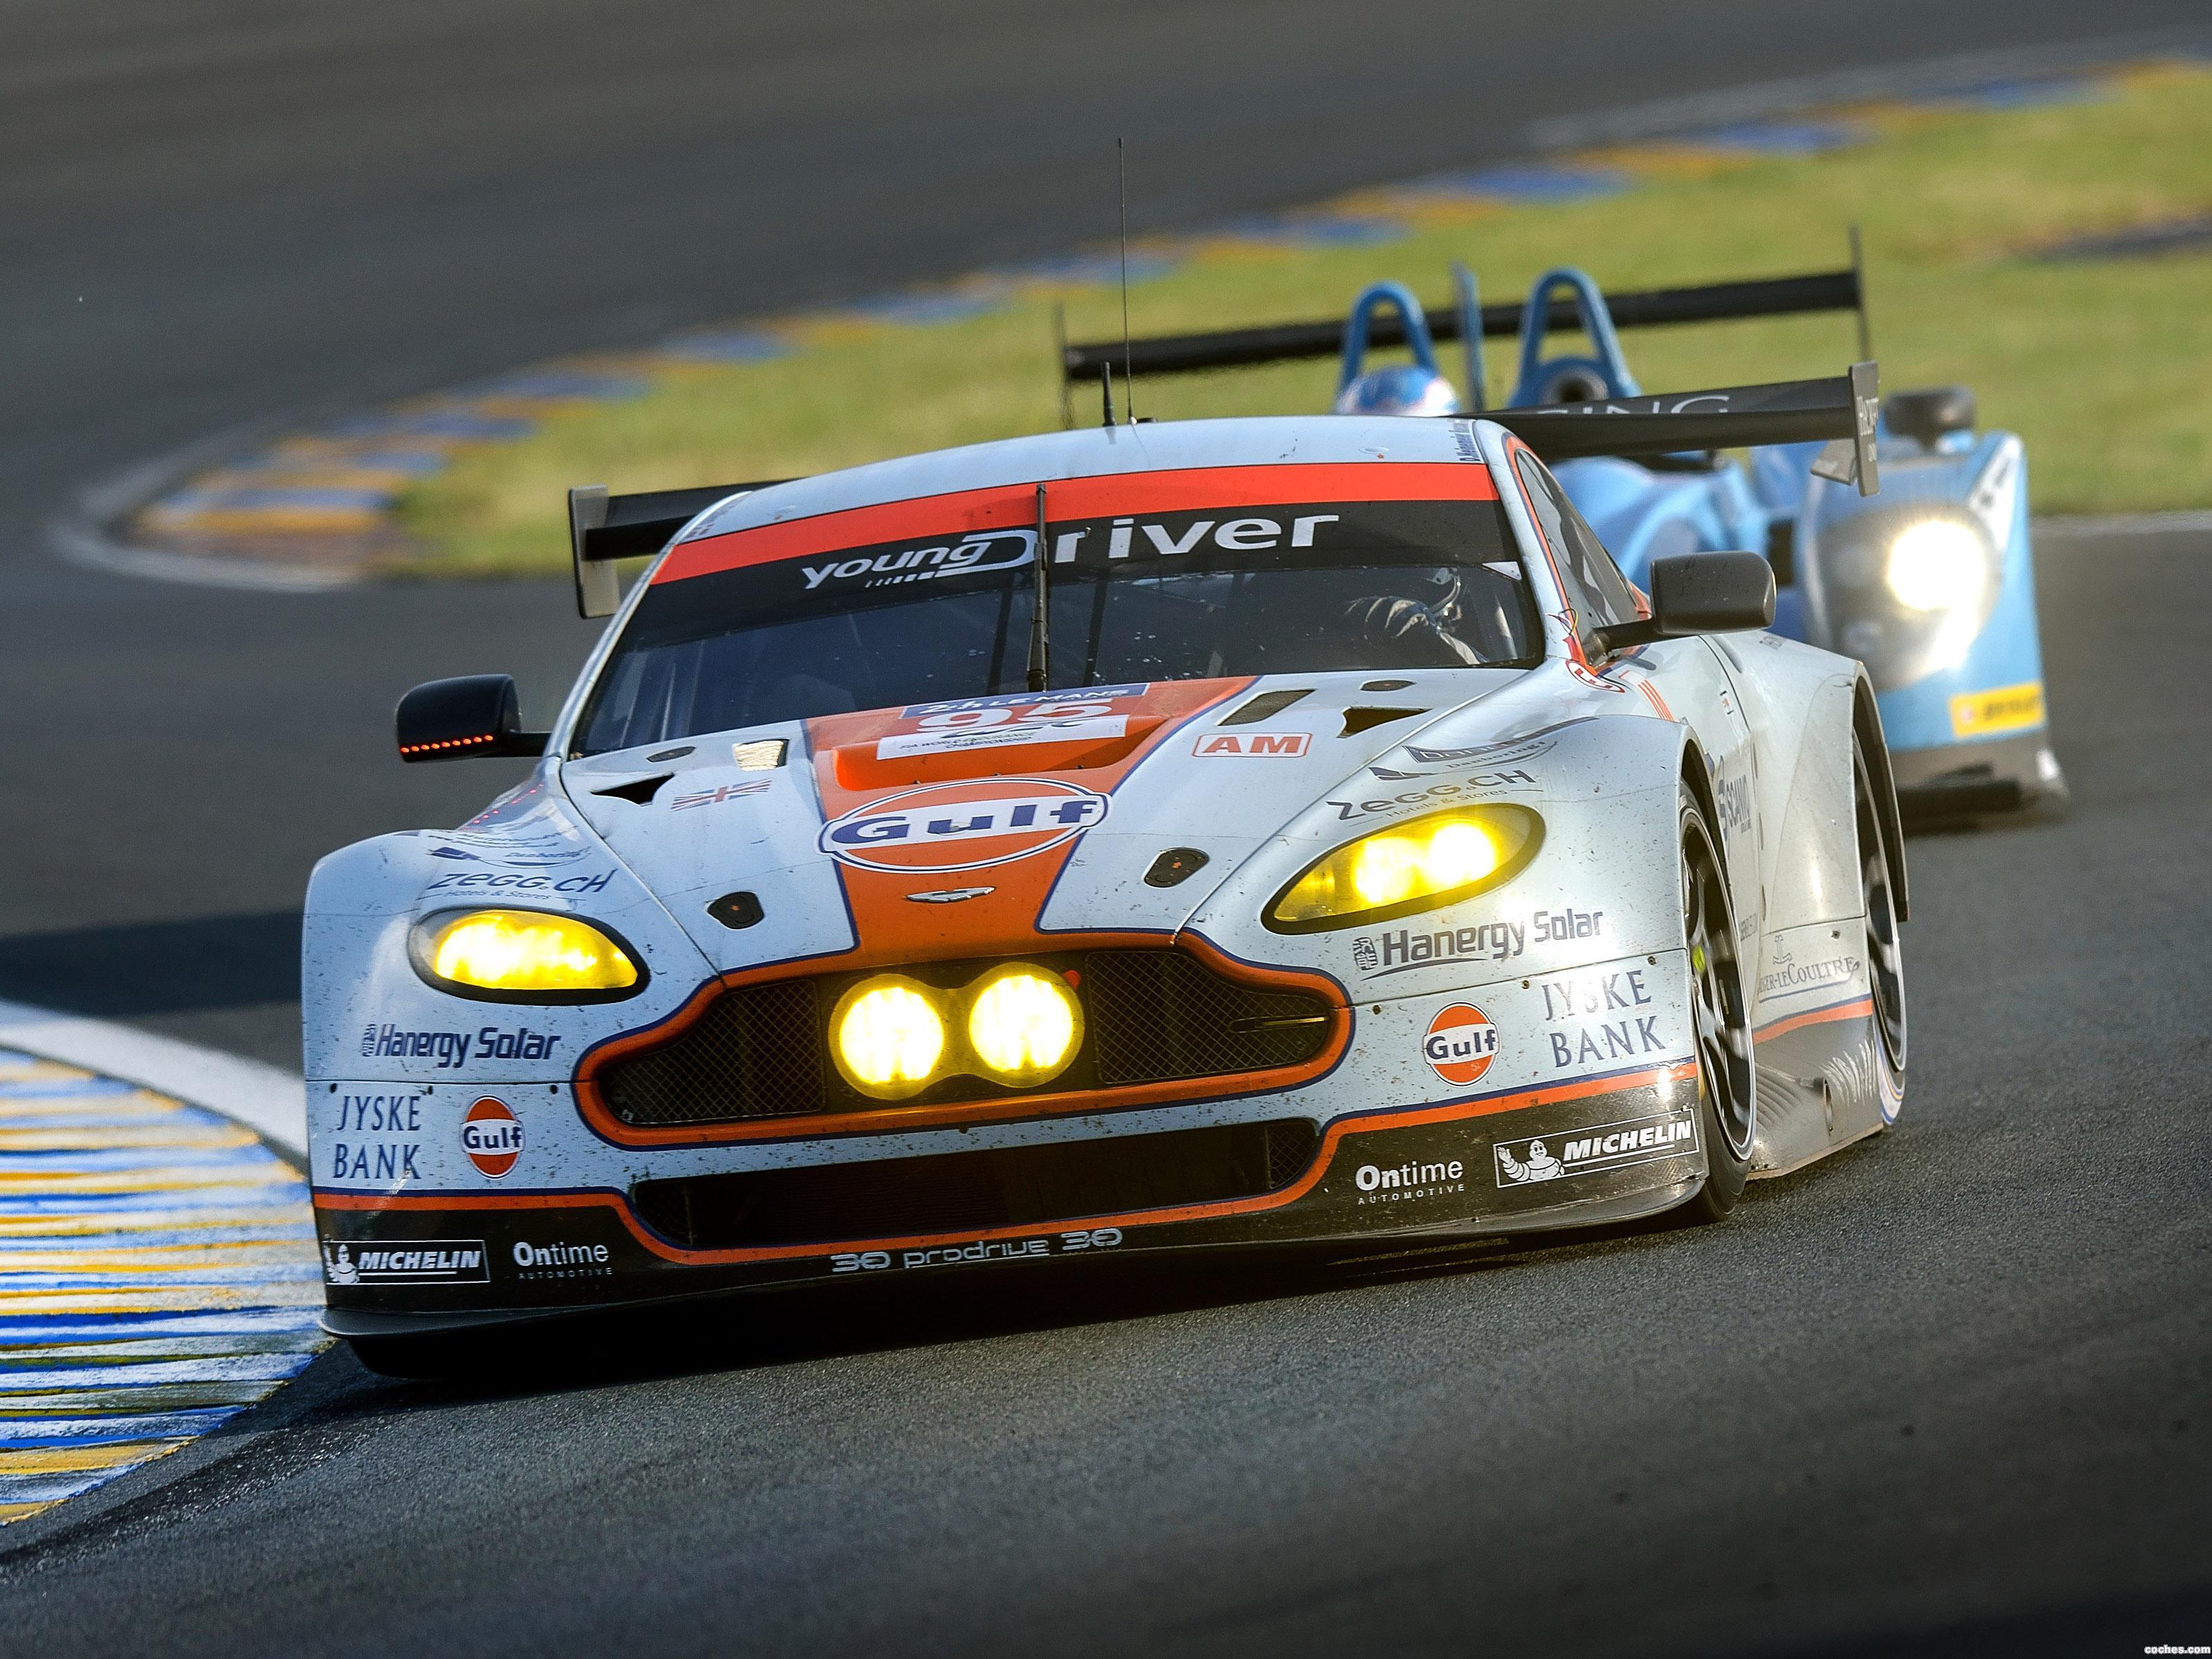 Foto 0 de Aston Martin V8 Vantage GTE 2014